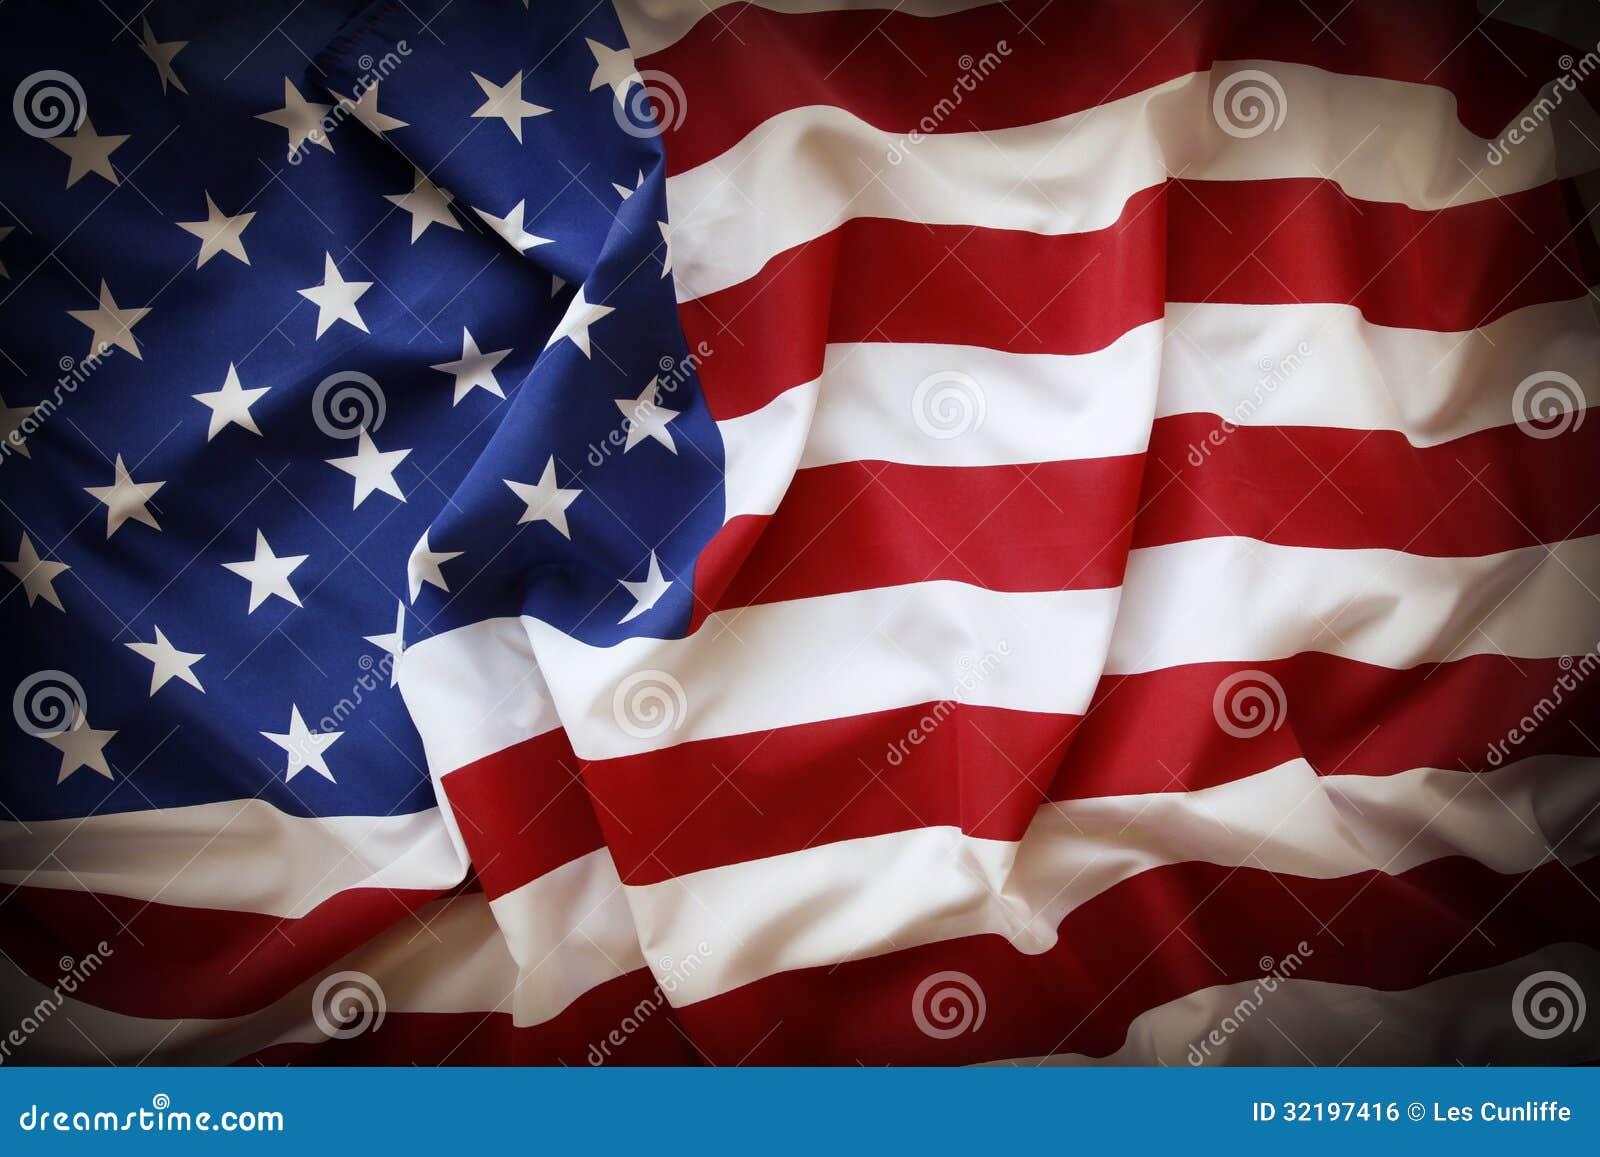 27be24f12dc5 Closeup of ruffled American flag. Dark edges